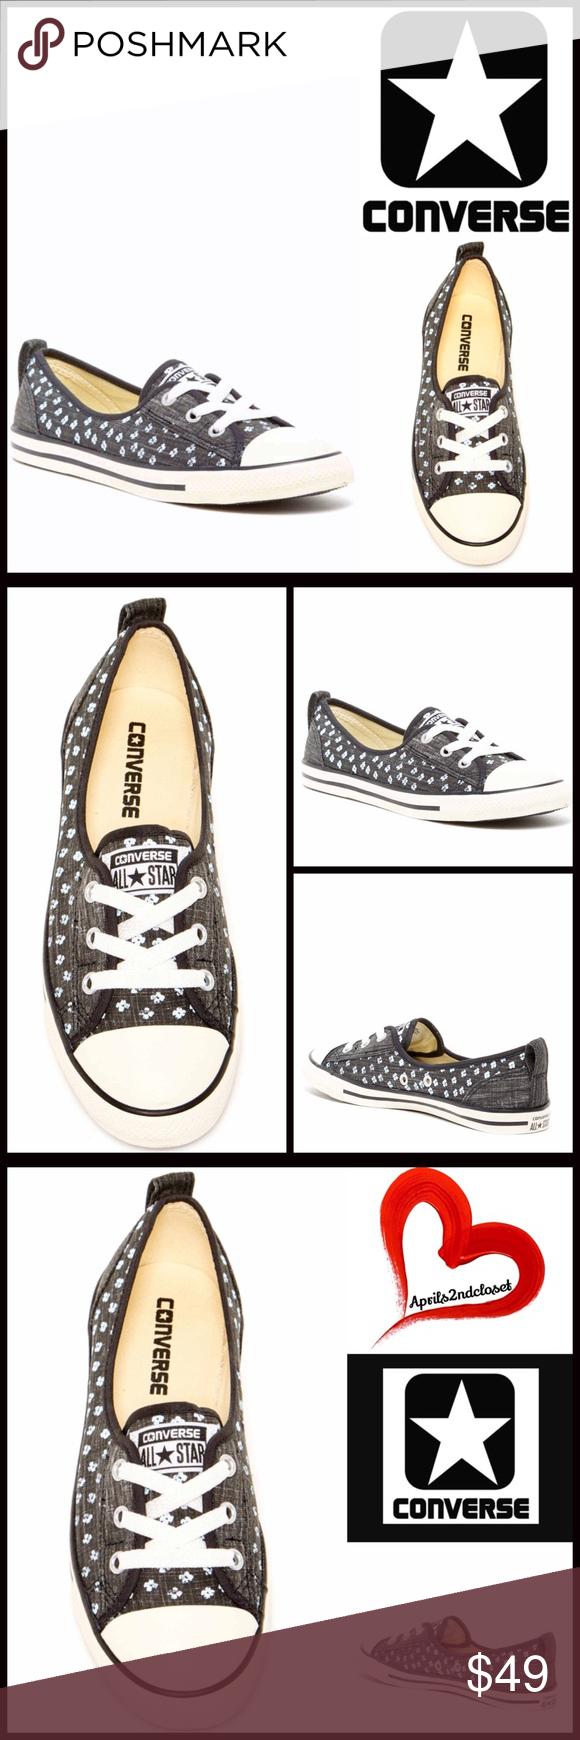 Converse clipart flat shoe CONVERSE OxfordNWT Stylish SNEAKERS Classic